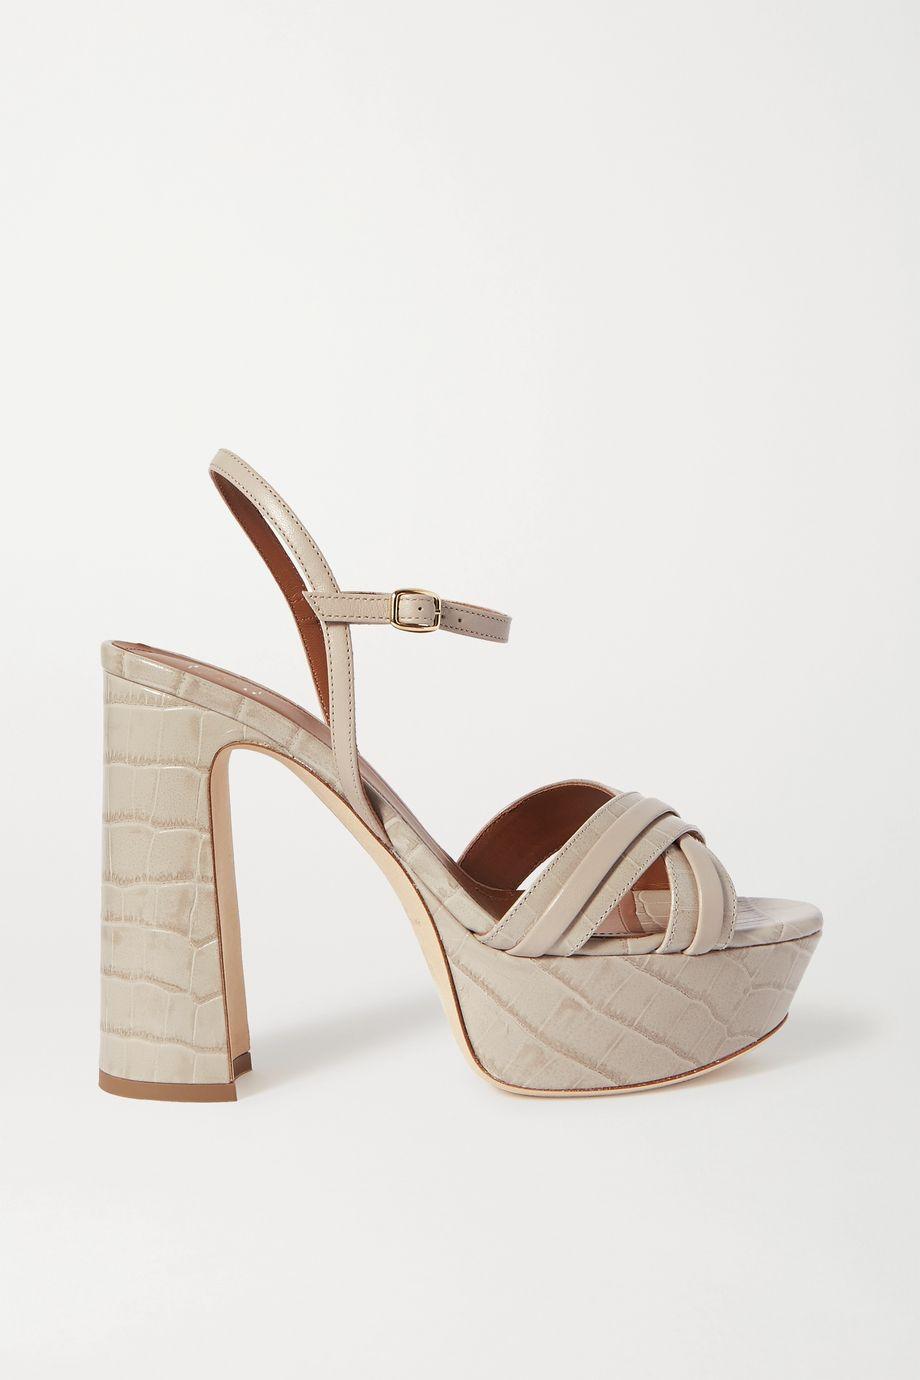 Malone Souliers Mila croc-effect leather platform sandals